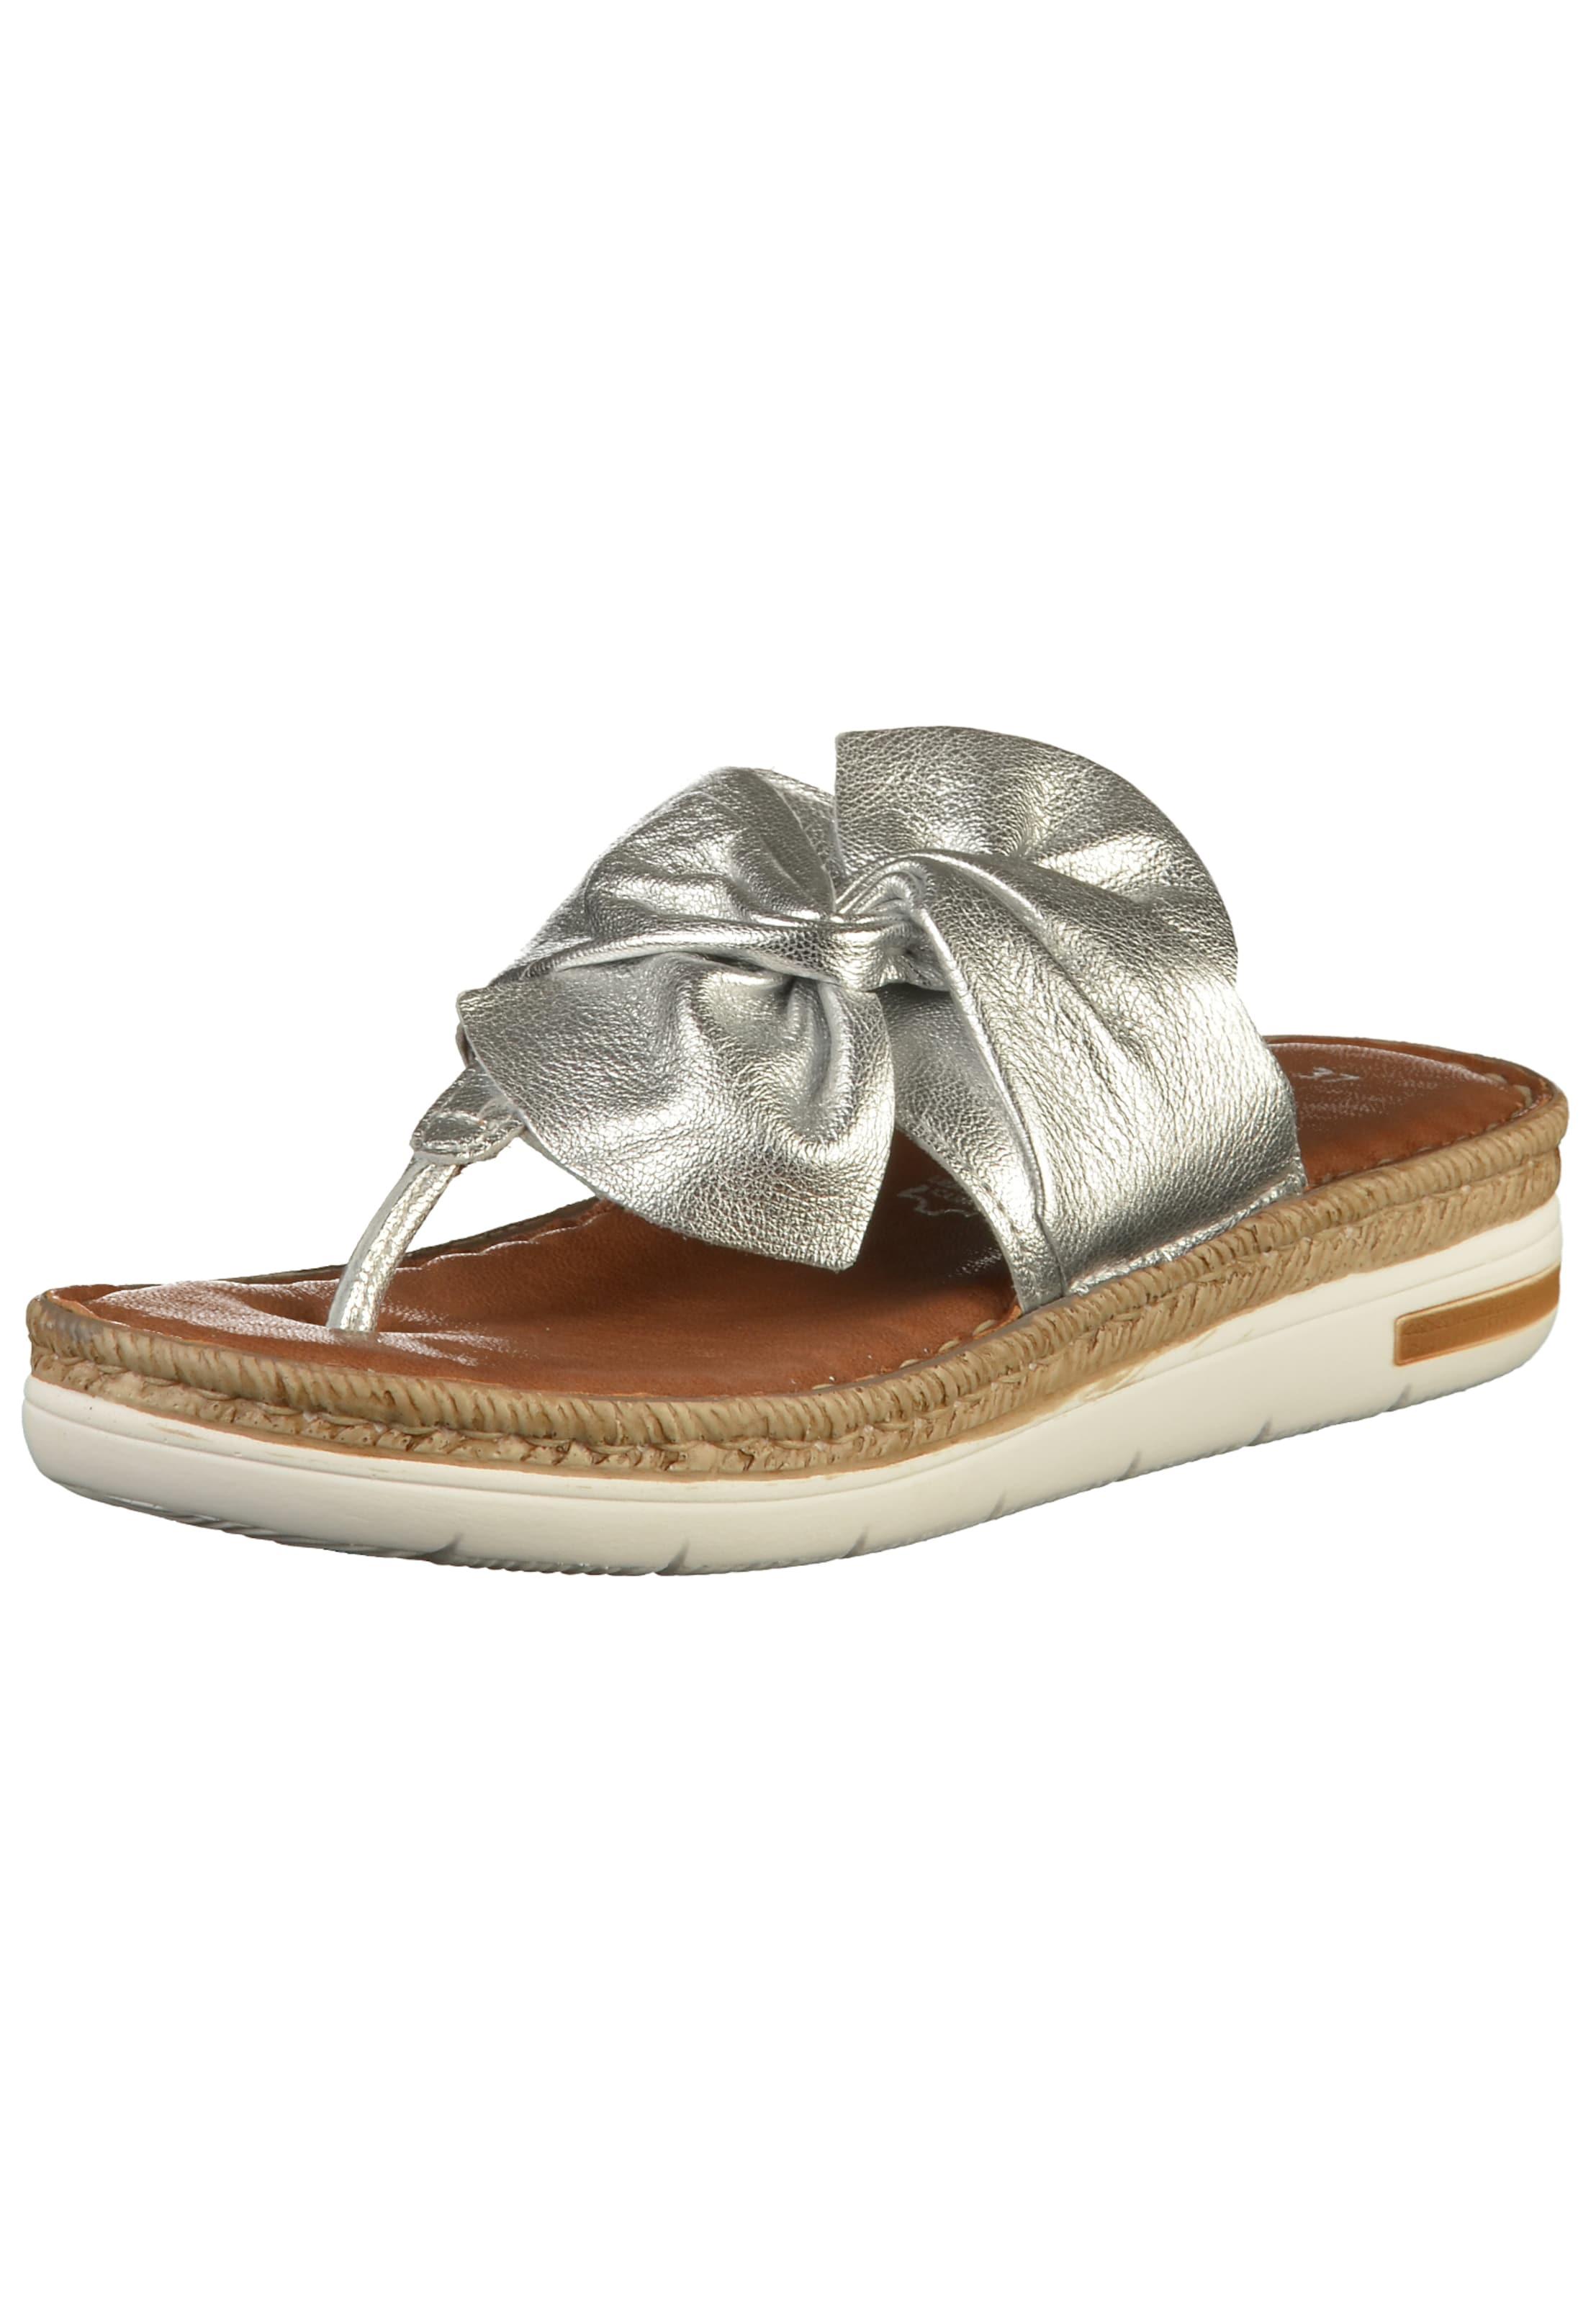 MARCO TOZZI Pantoletten Verschleißfeste billige Schuhe